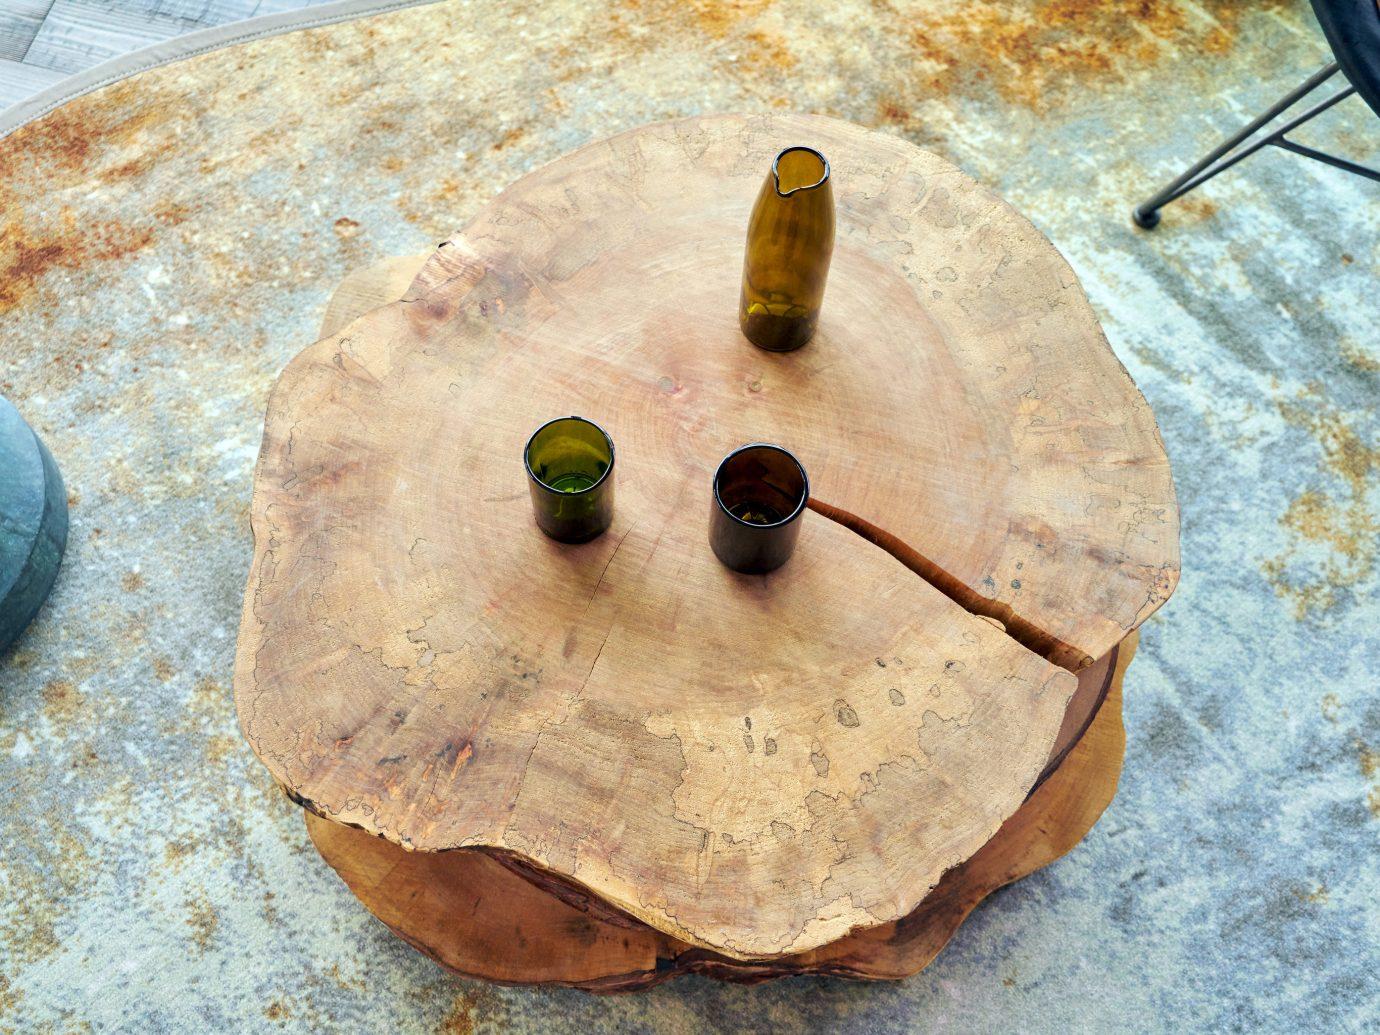 Hotels ground food rock dish wood produce material baking cuisine eaten